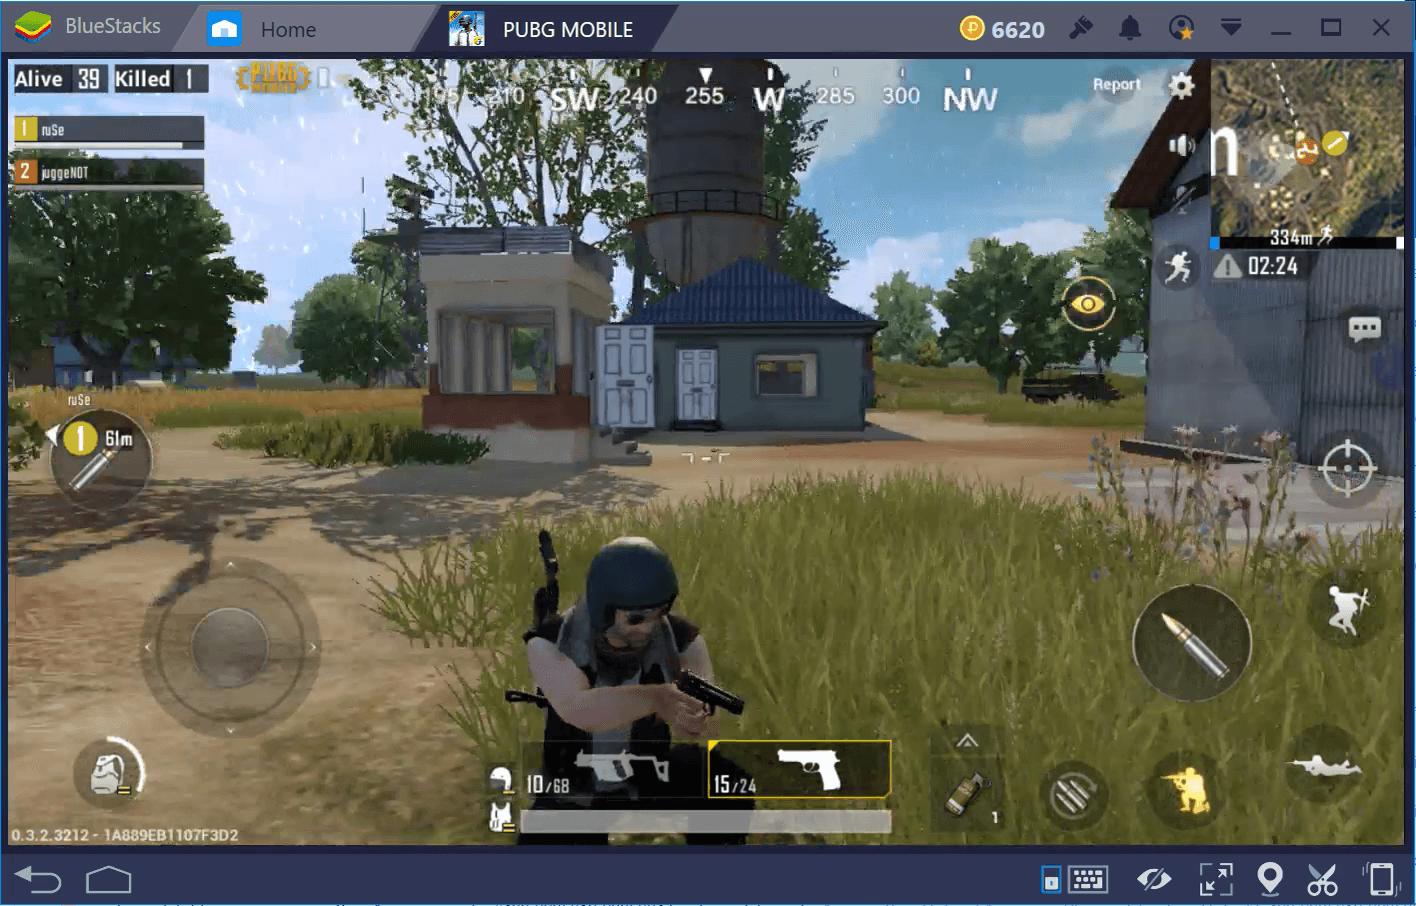 Ultimate PUBG Mobile Weapon Guide BlueStacks